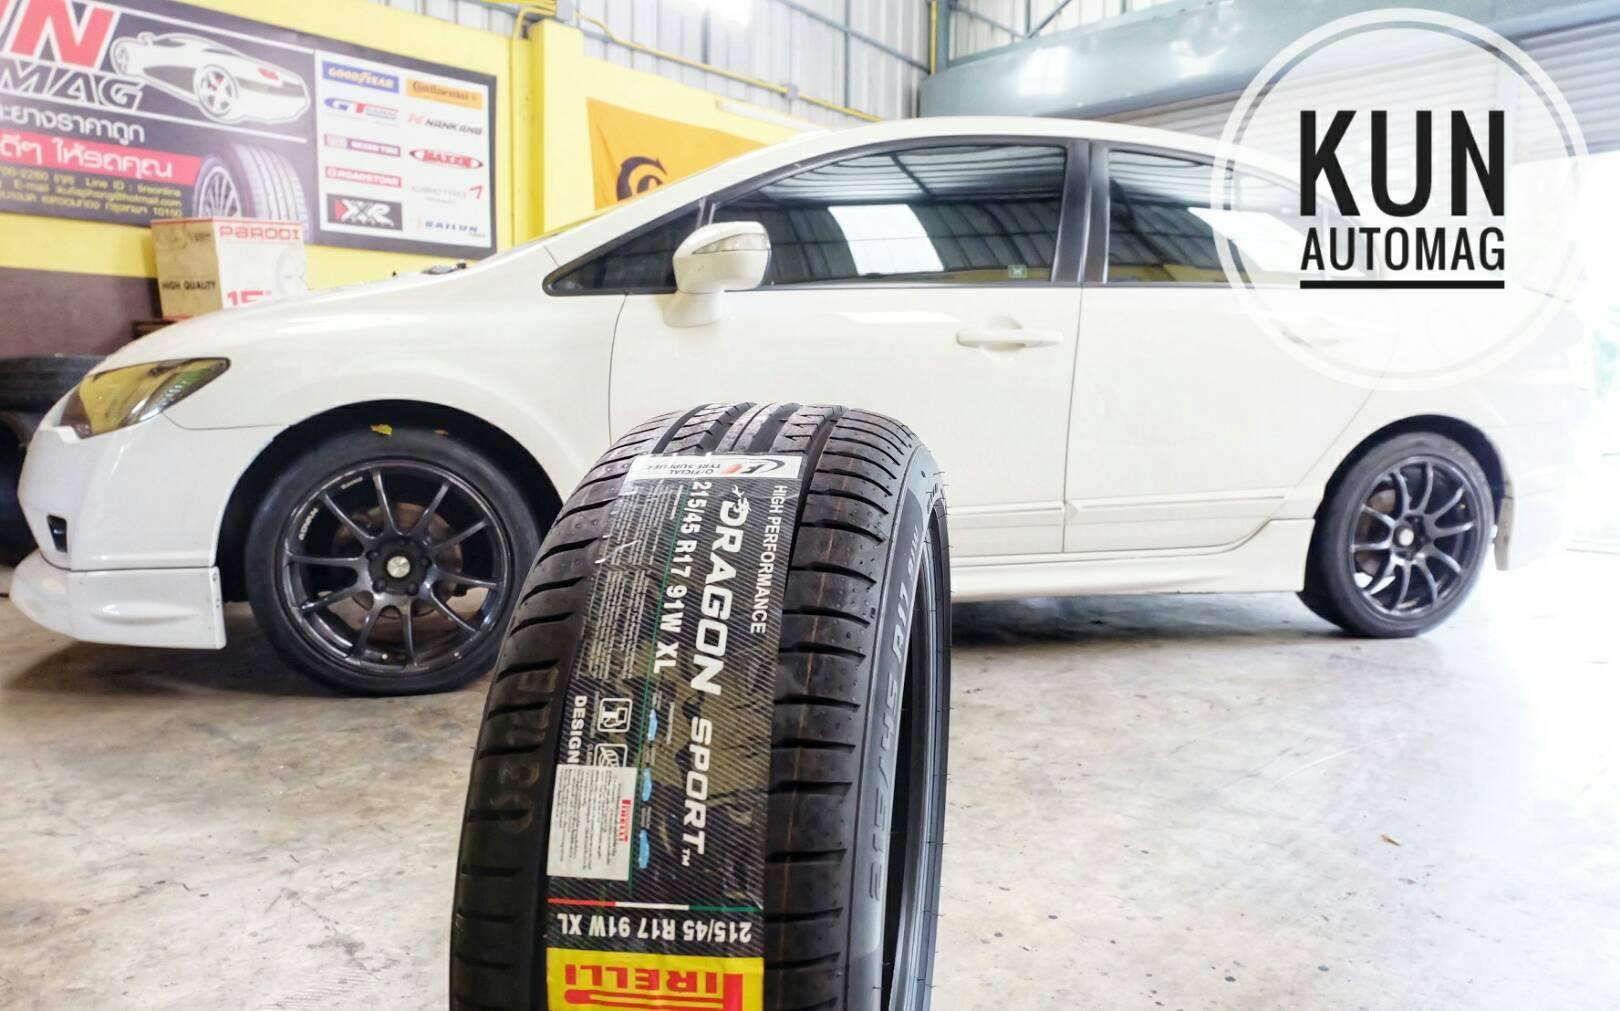 Pirelli Dragon Sport > 215/45/17 > Handa Civic